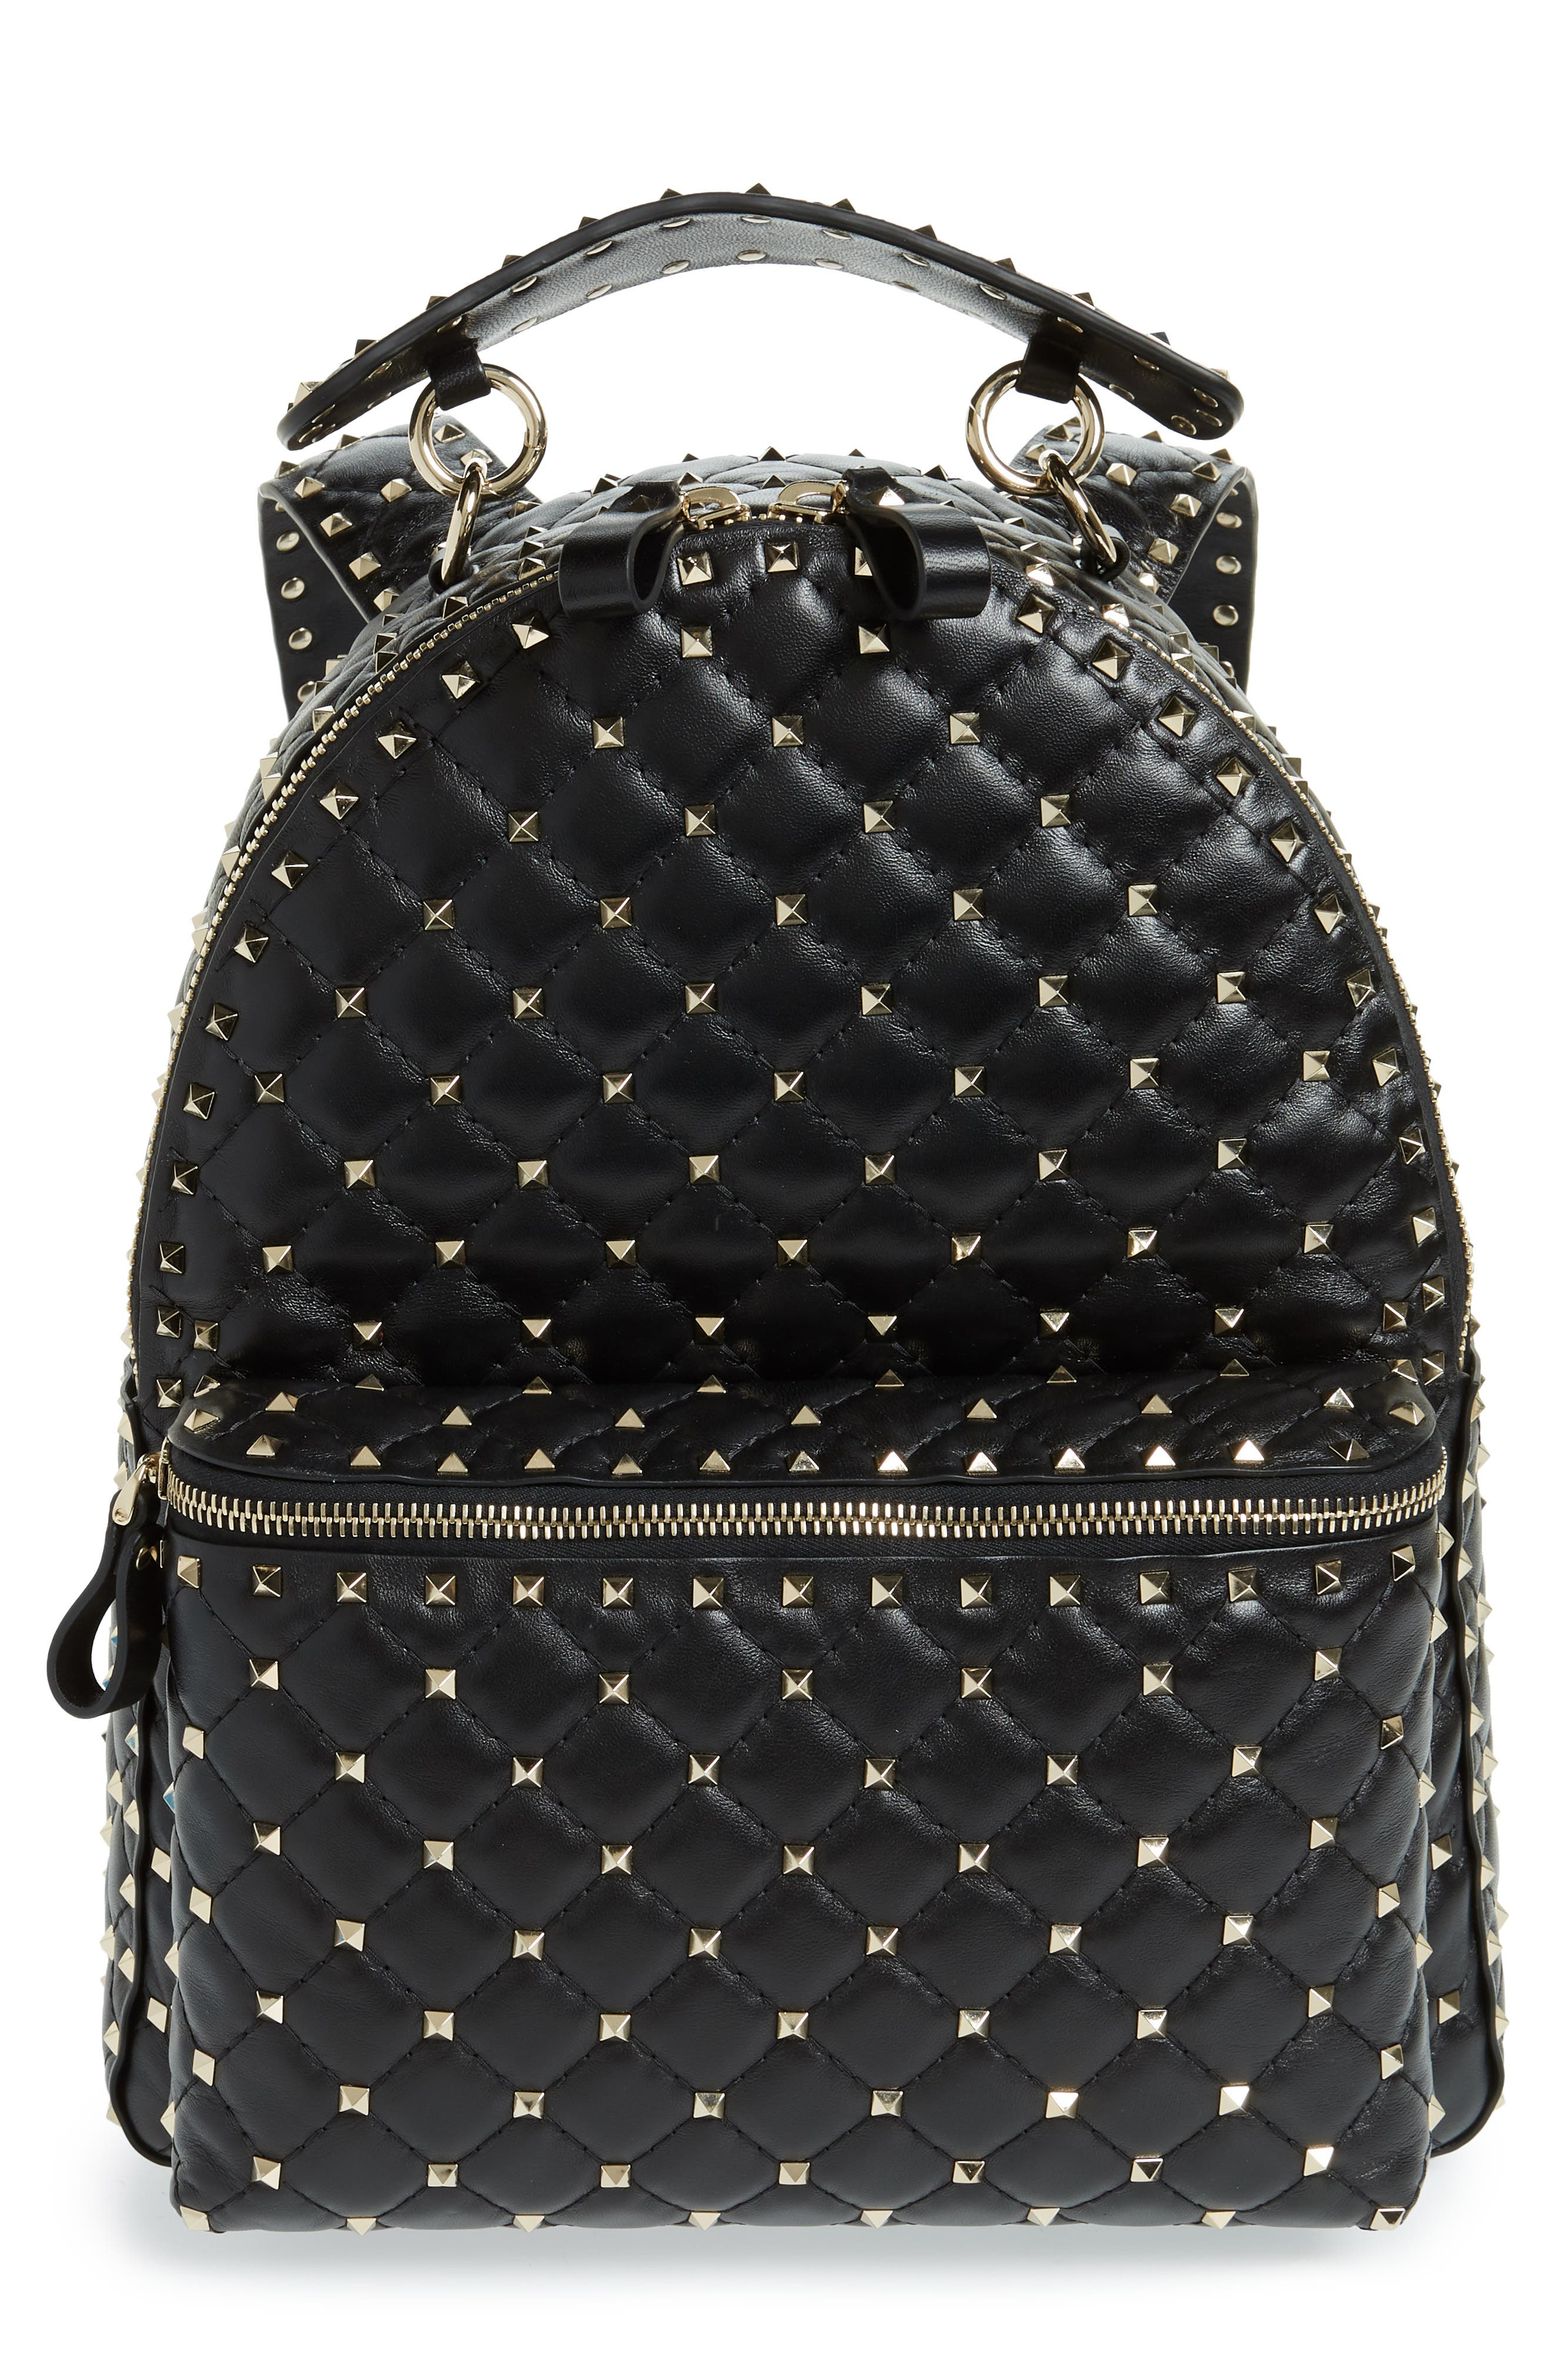 VALENTINO GARAVANI Rockstud Spike Quilted Lambskin Leather Backpack